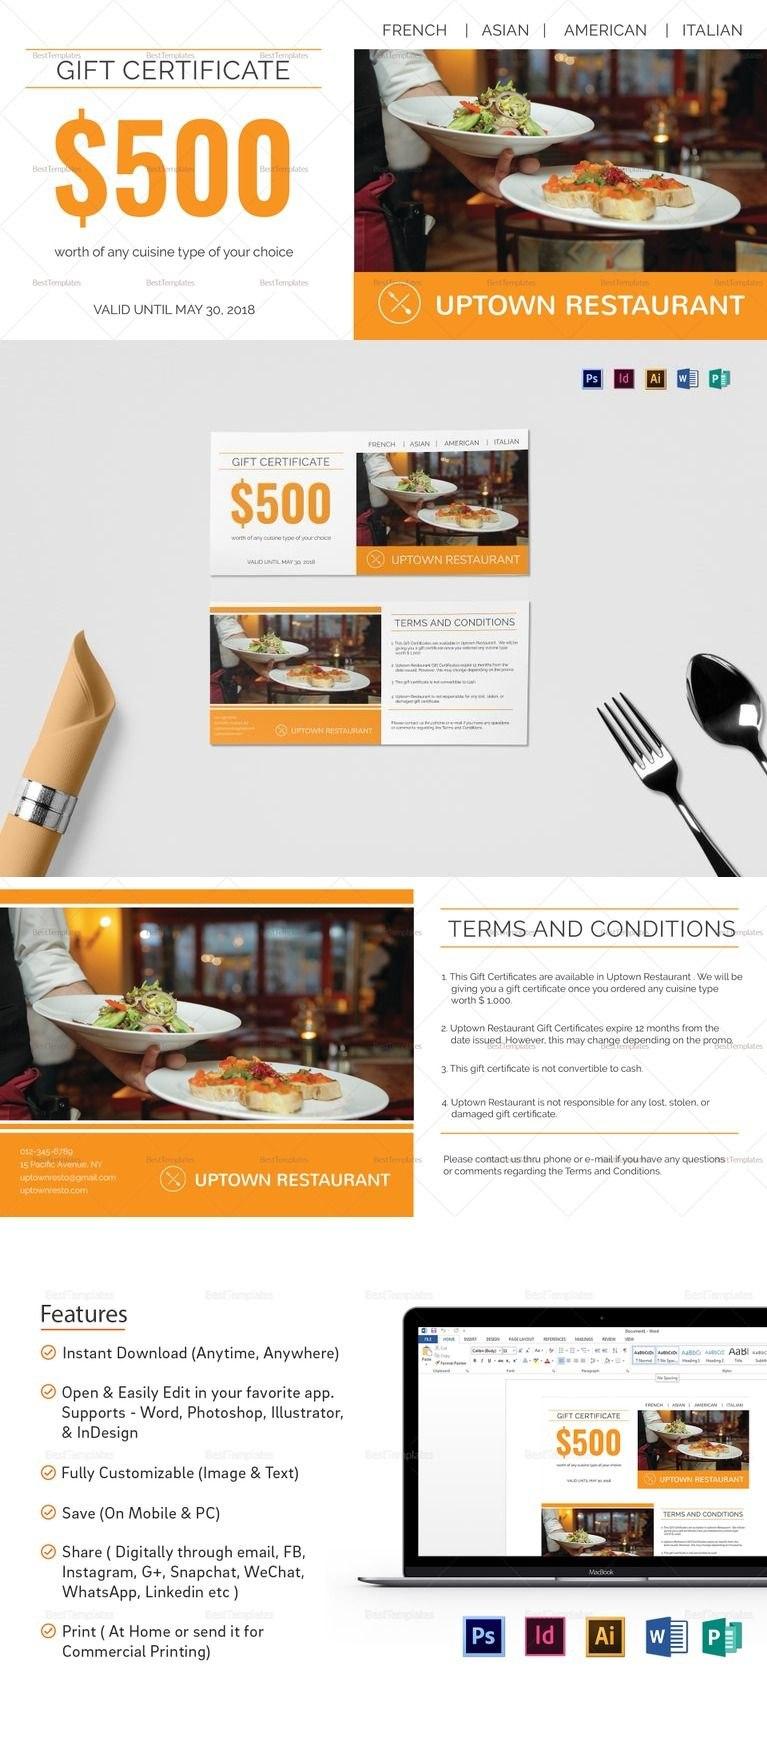 Restaurant Gift Certificate Template  ❱❱ Restaurant Templates Intended For Indesign Gift Certificate Template